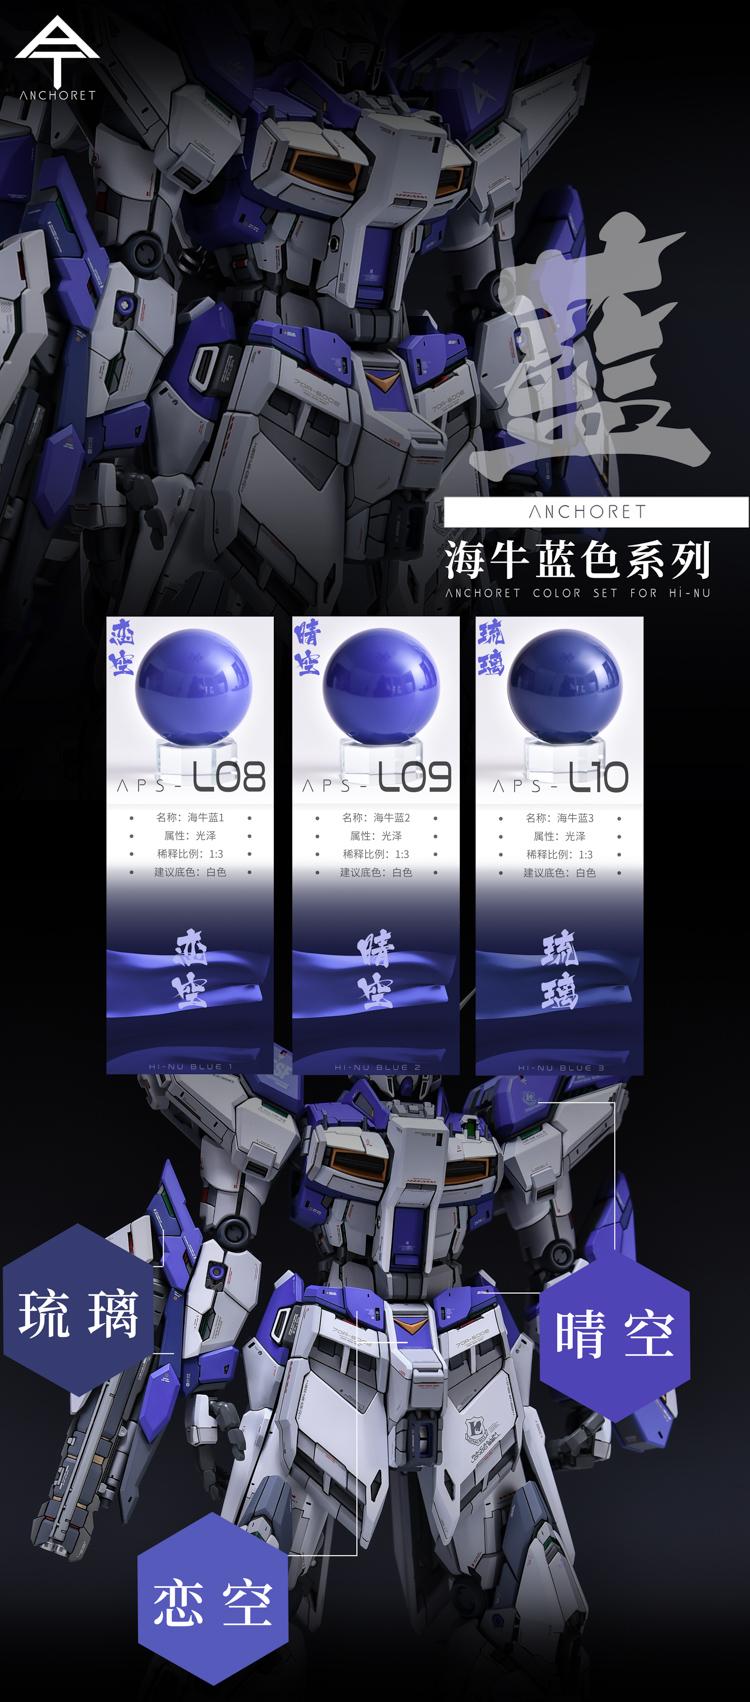 APS-L08-L10 ANCHORET